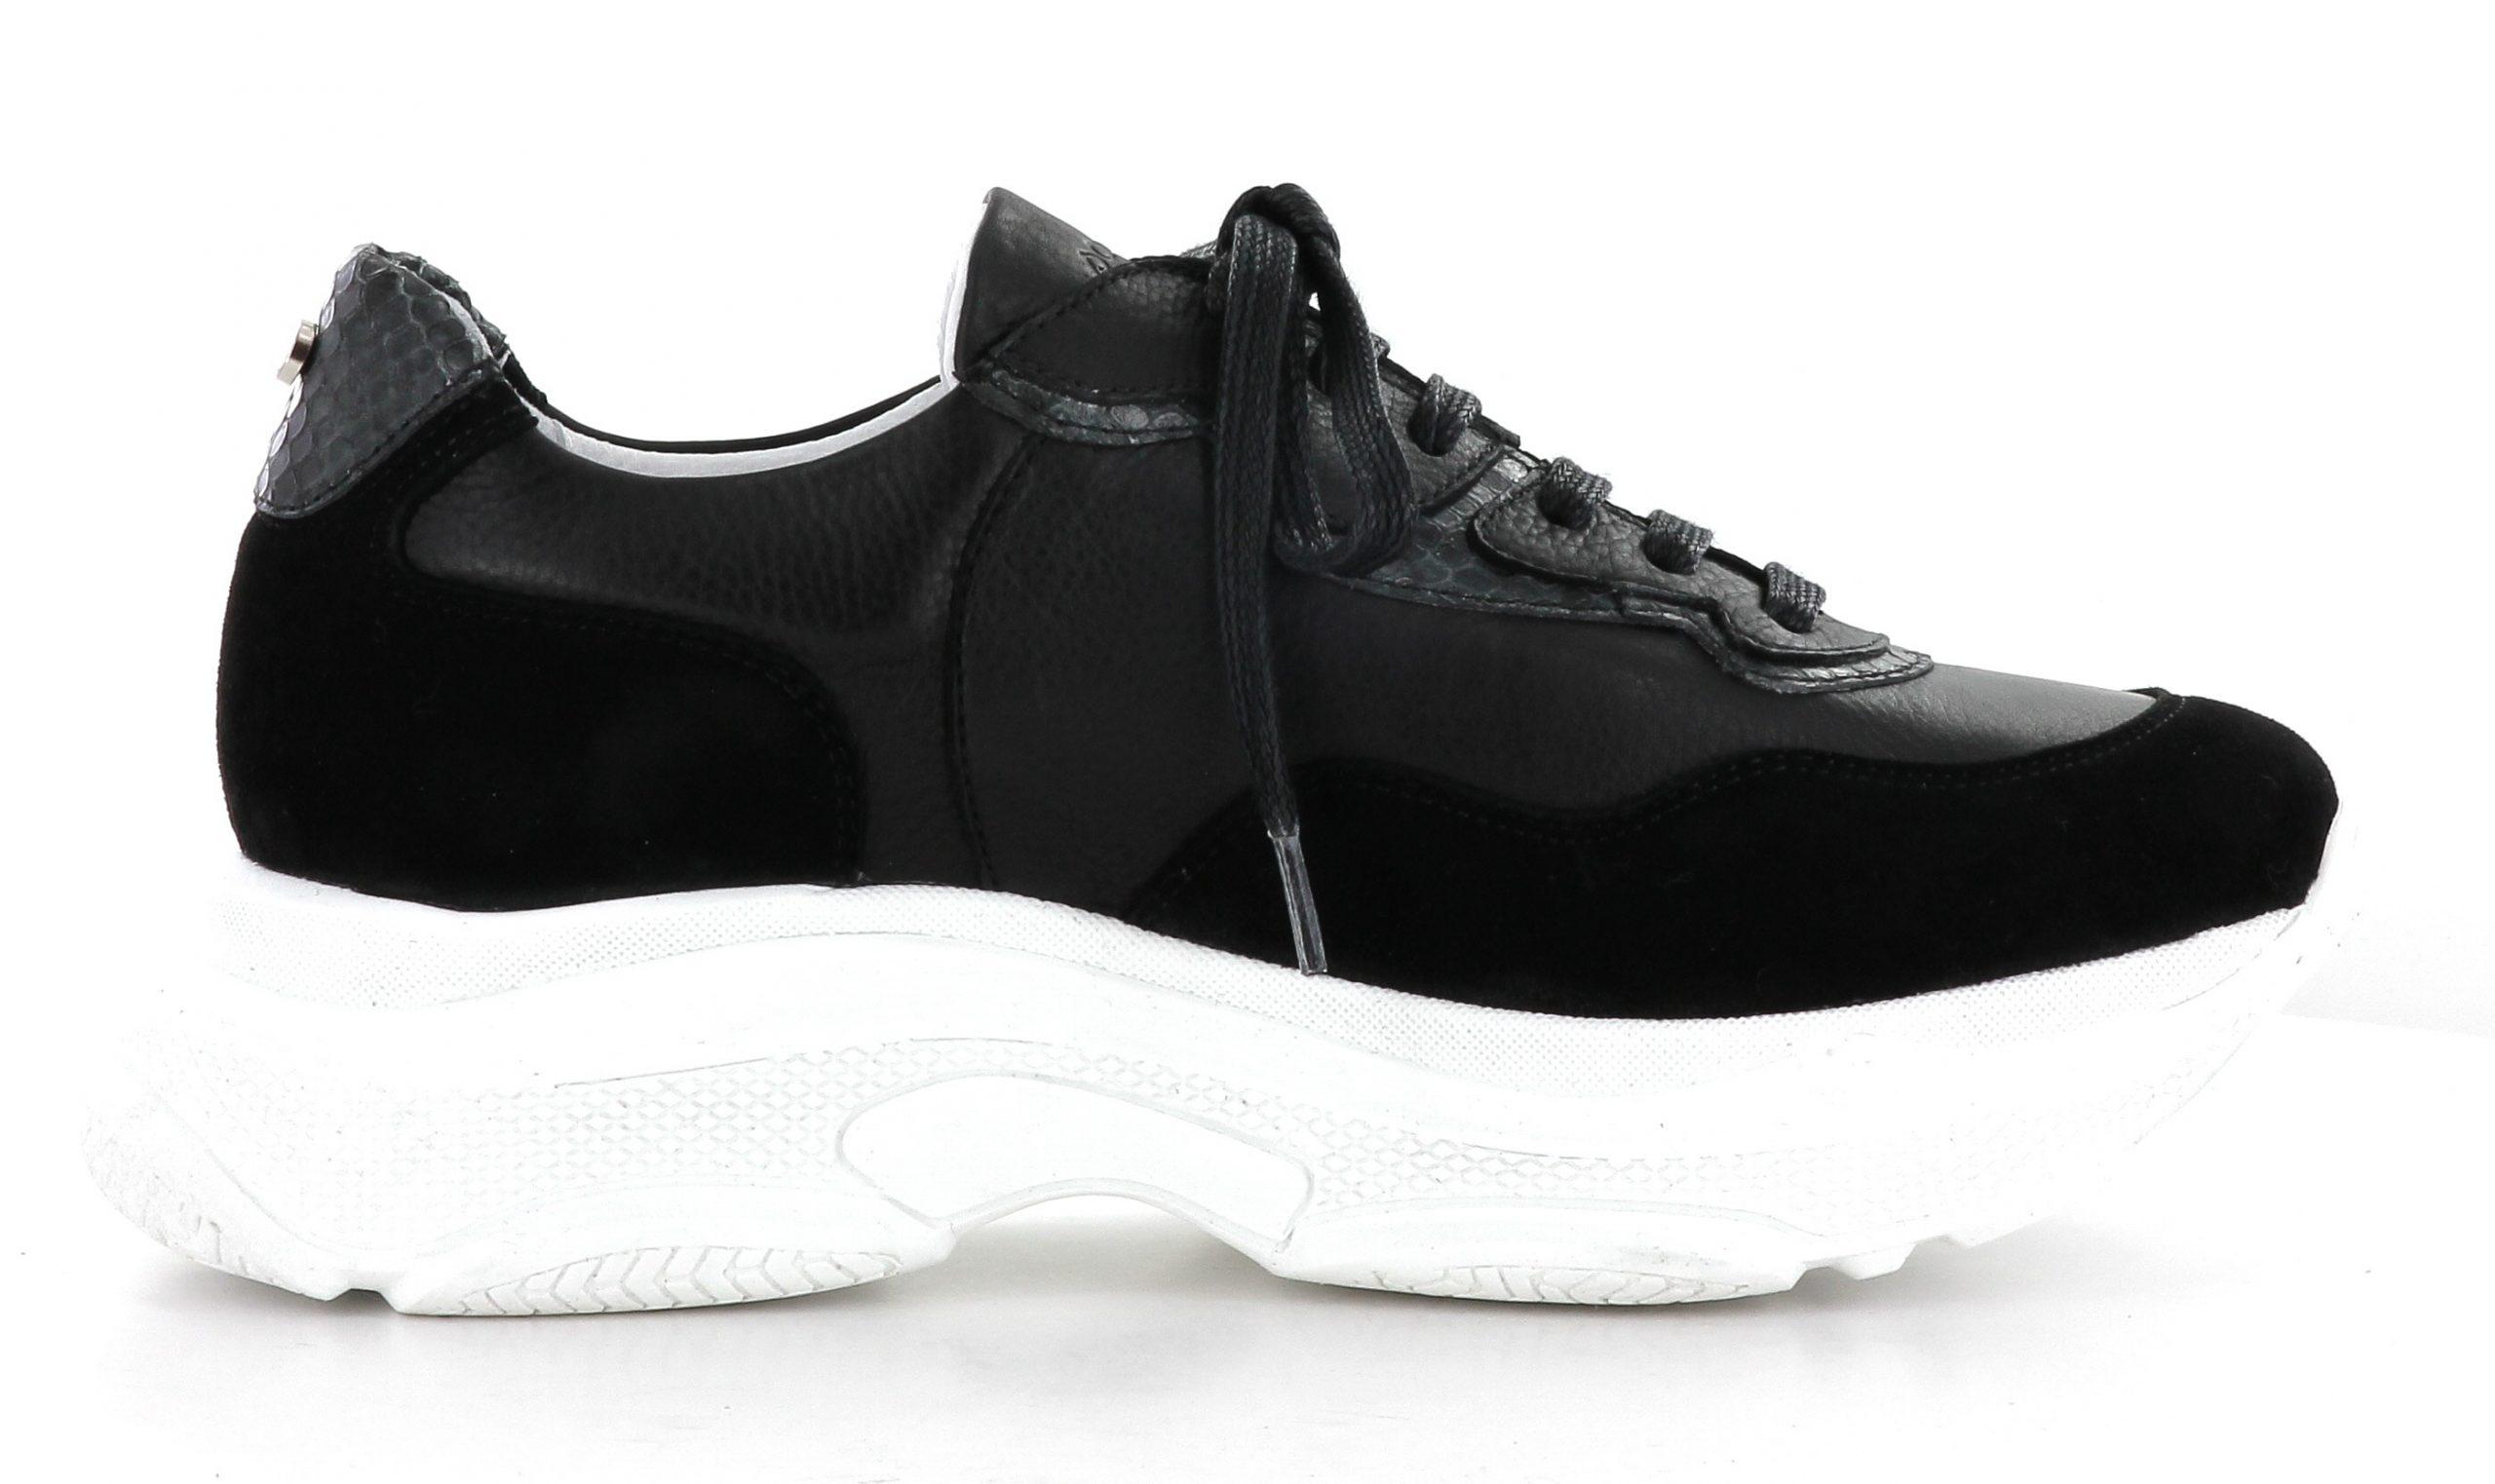 Sort Sapatos T Lolly Sneaker Sko